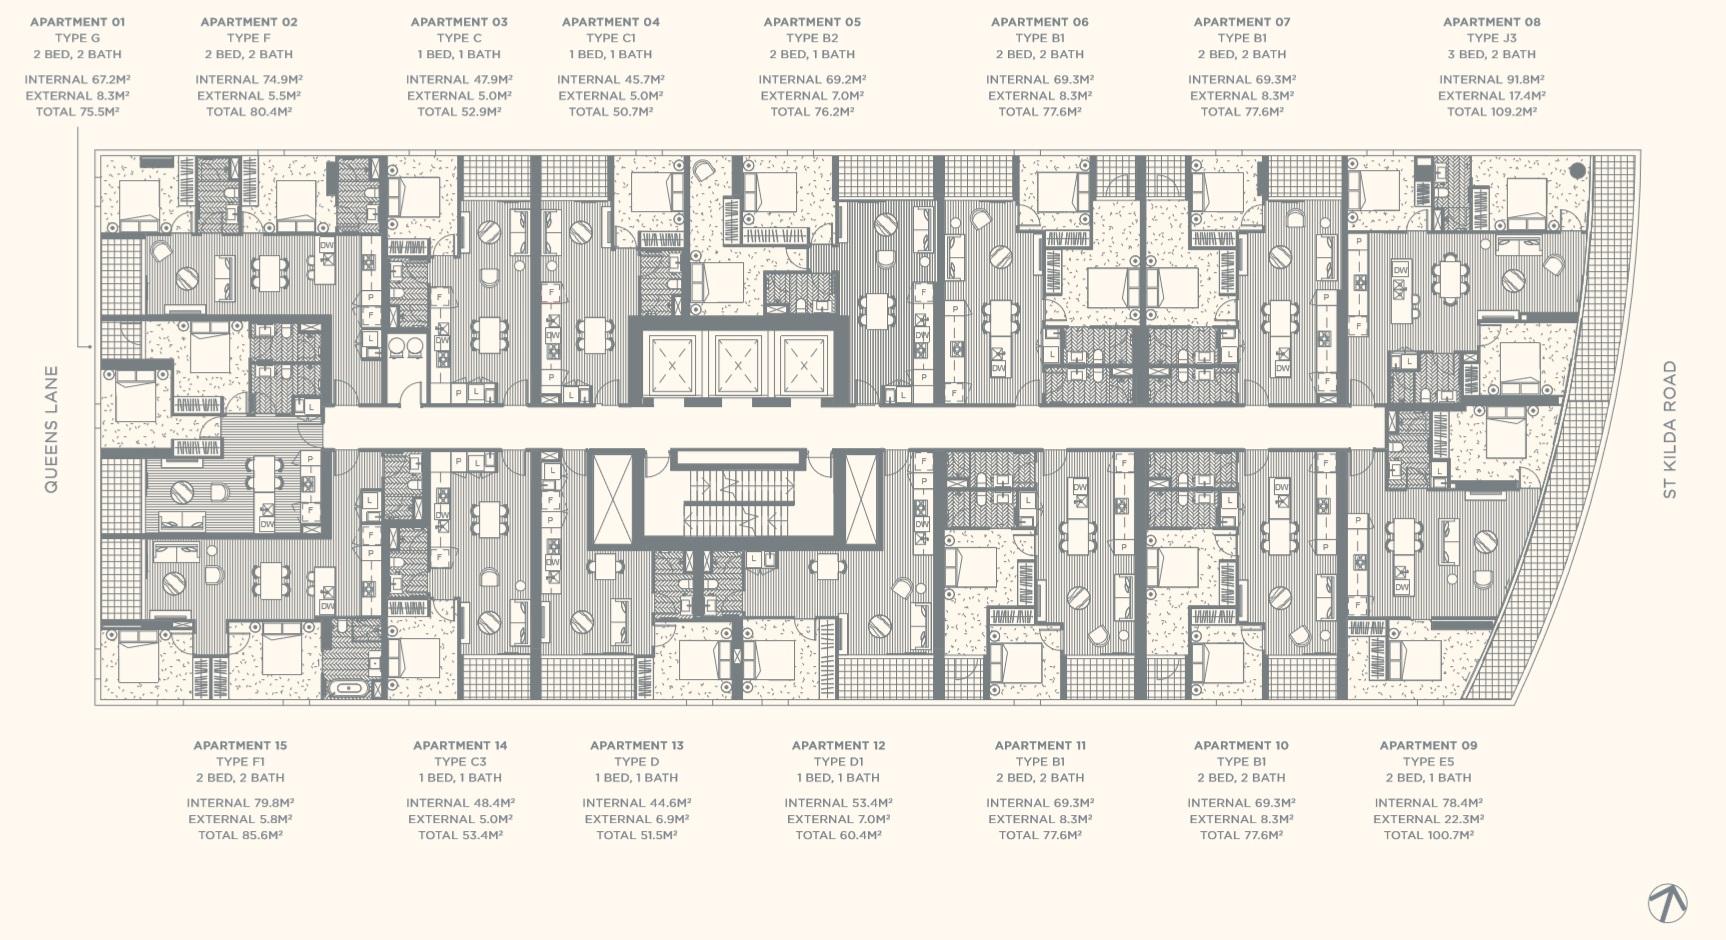 Floor Plate Level 05